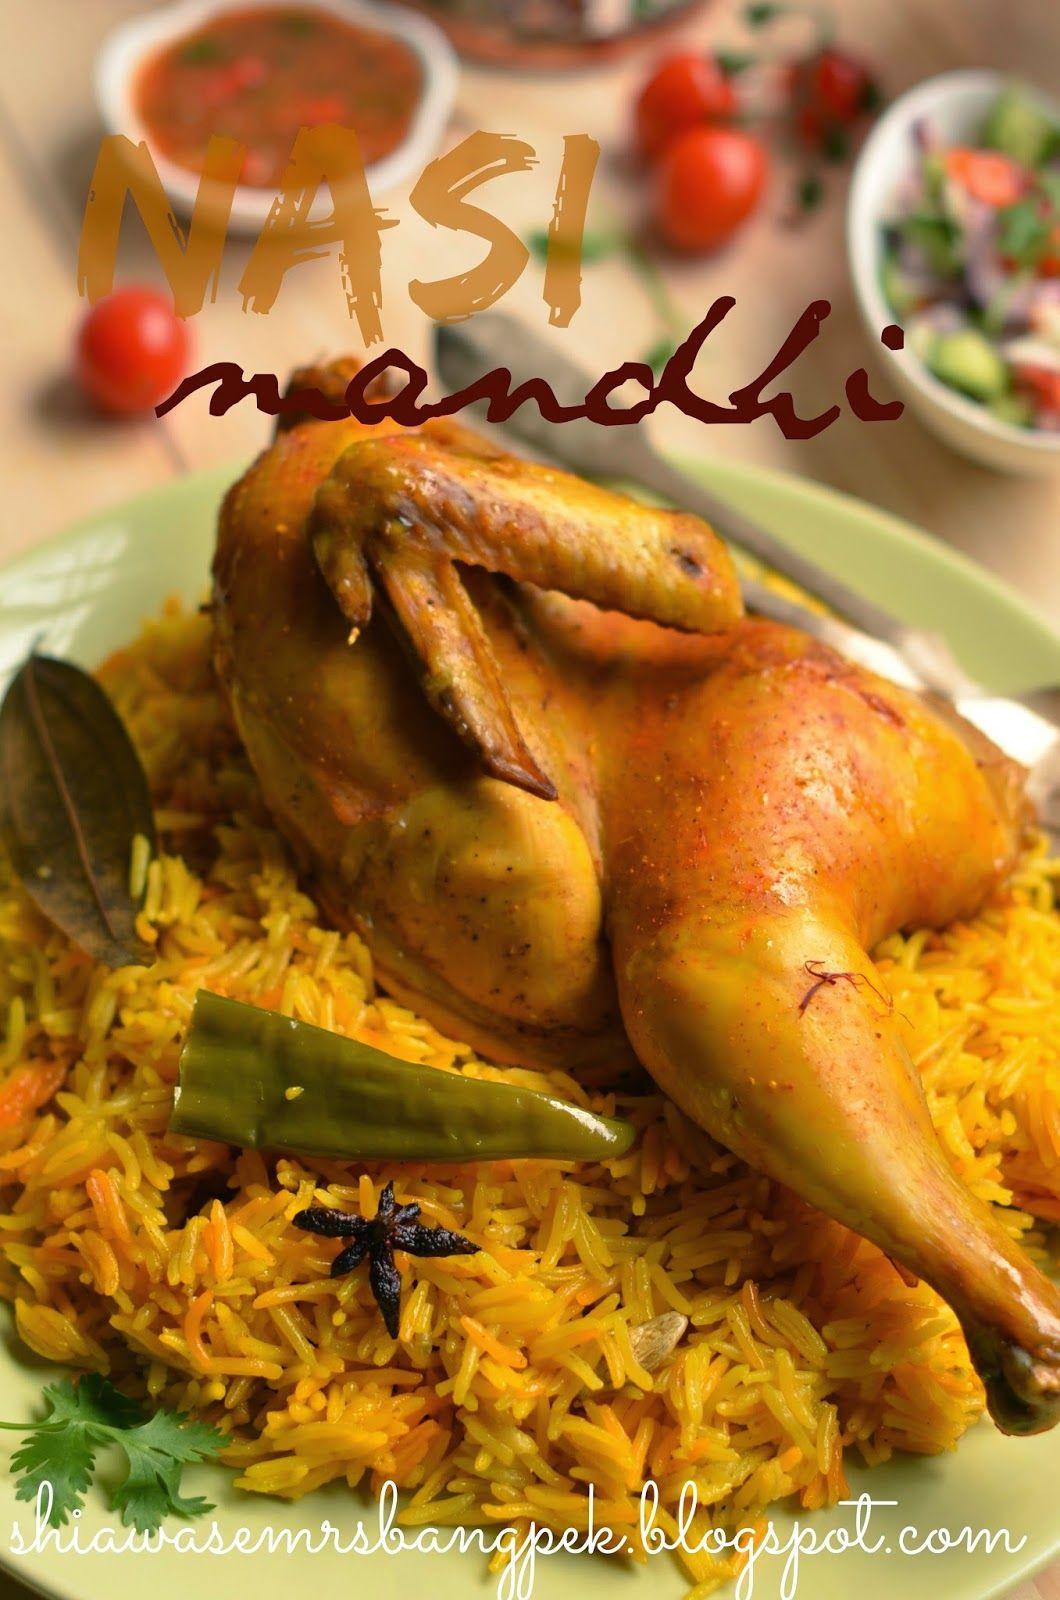 Nasi Mandhi Nasi Arab Resep Masakan Malaysia Resep Makanan Masakan